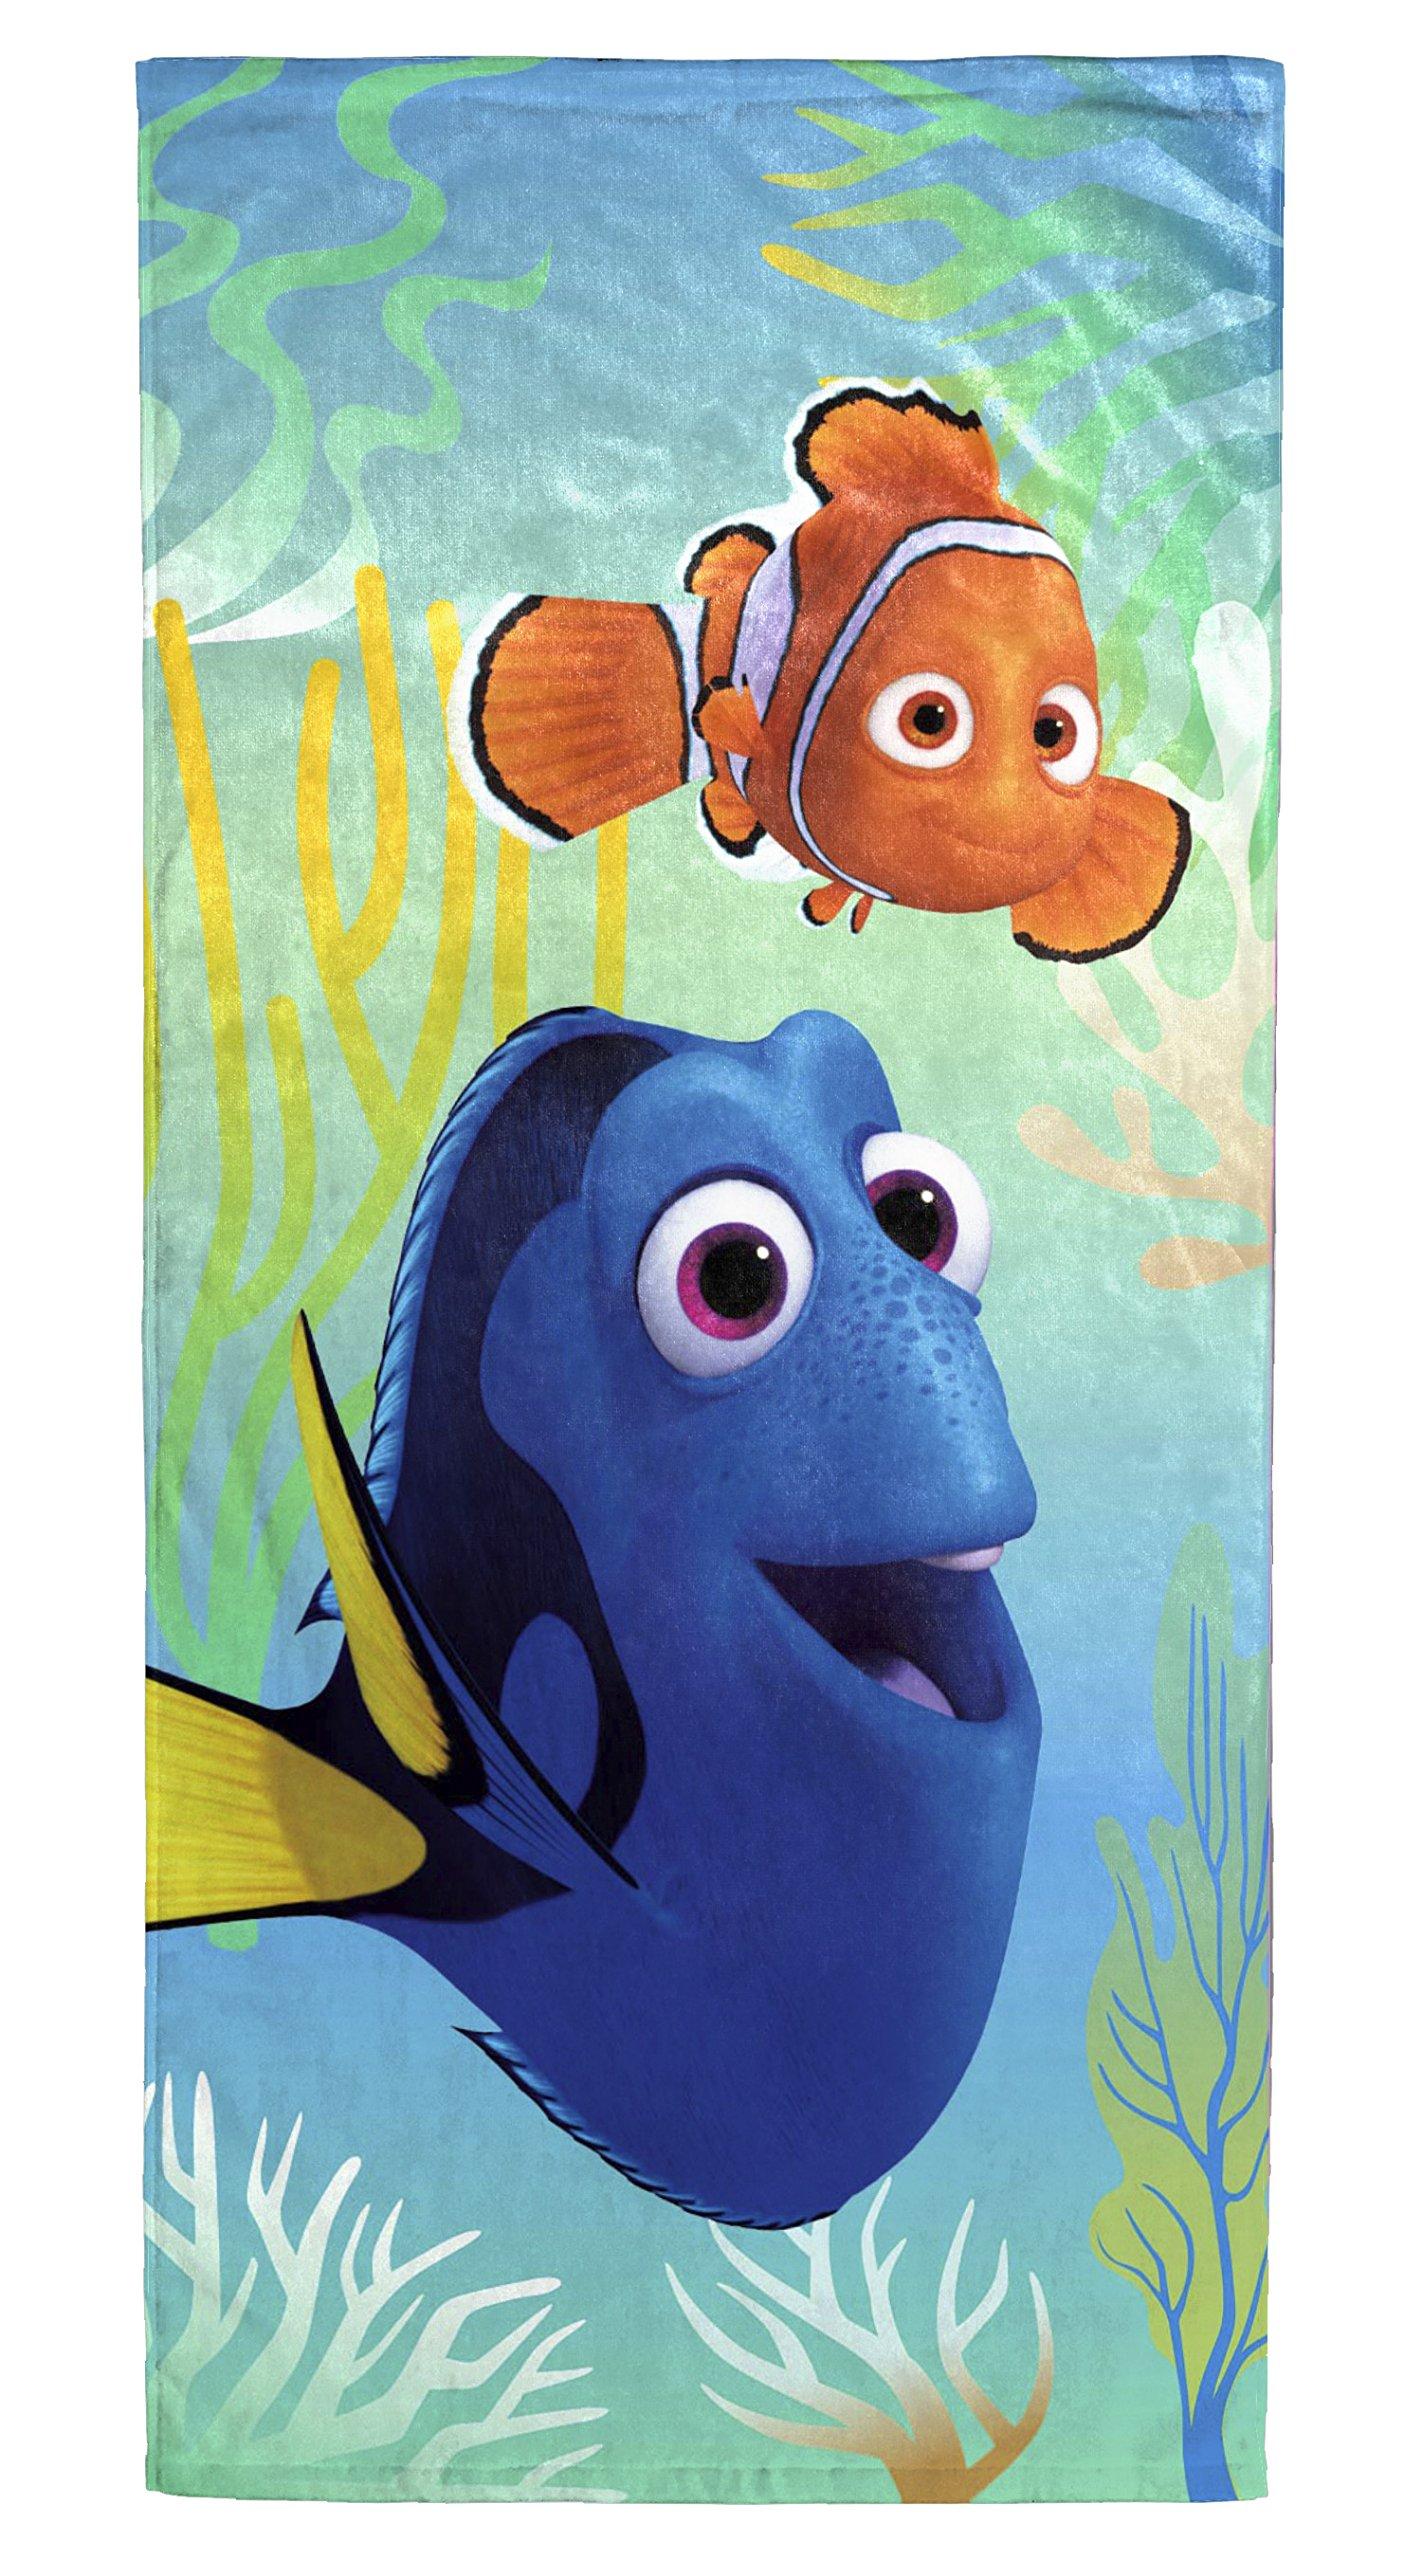 "Disney Pixar Finding Dory 'Wavy Days' Cotton Beach/Bath/Pool Towel, 28"" x 58"""